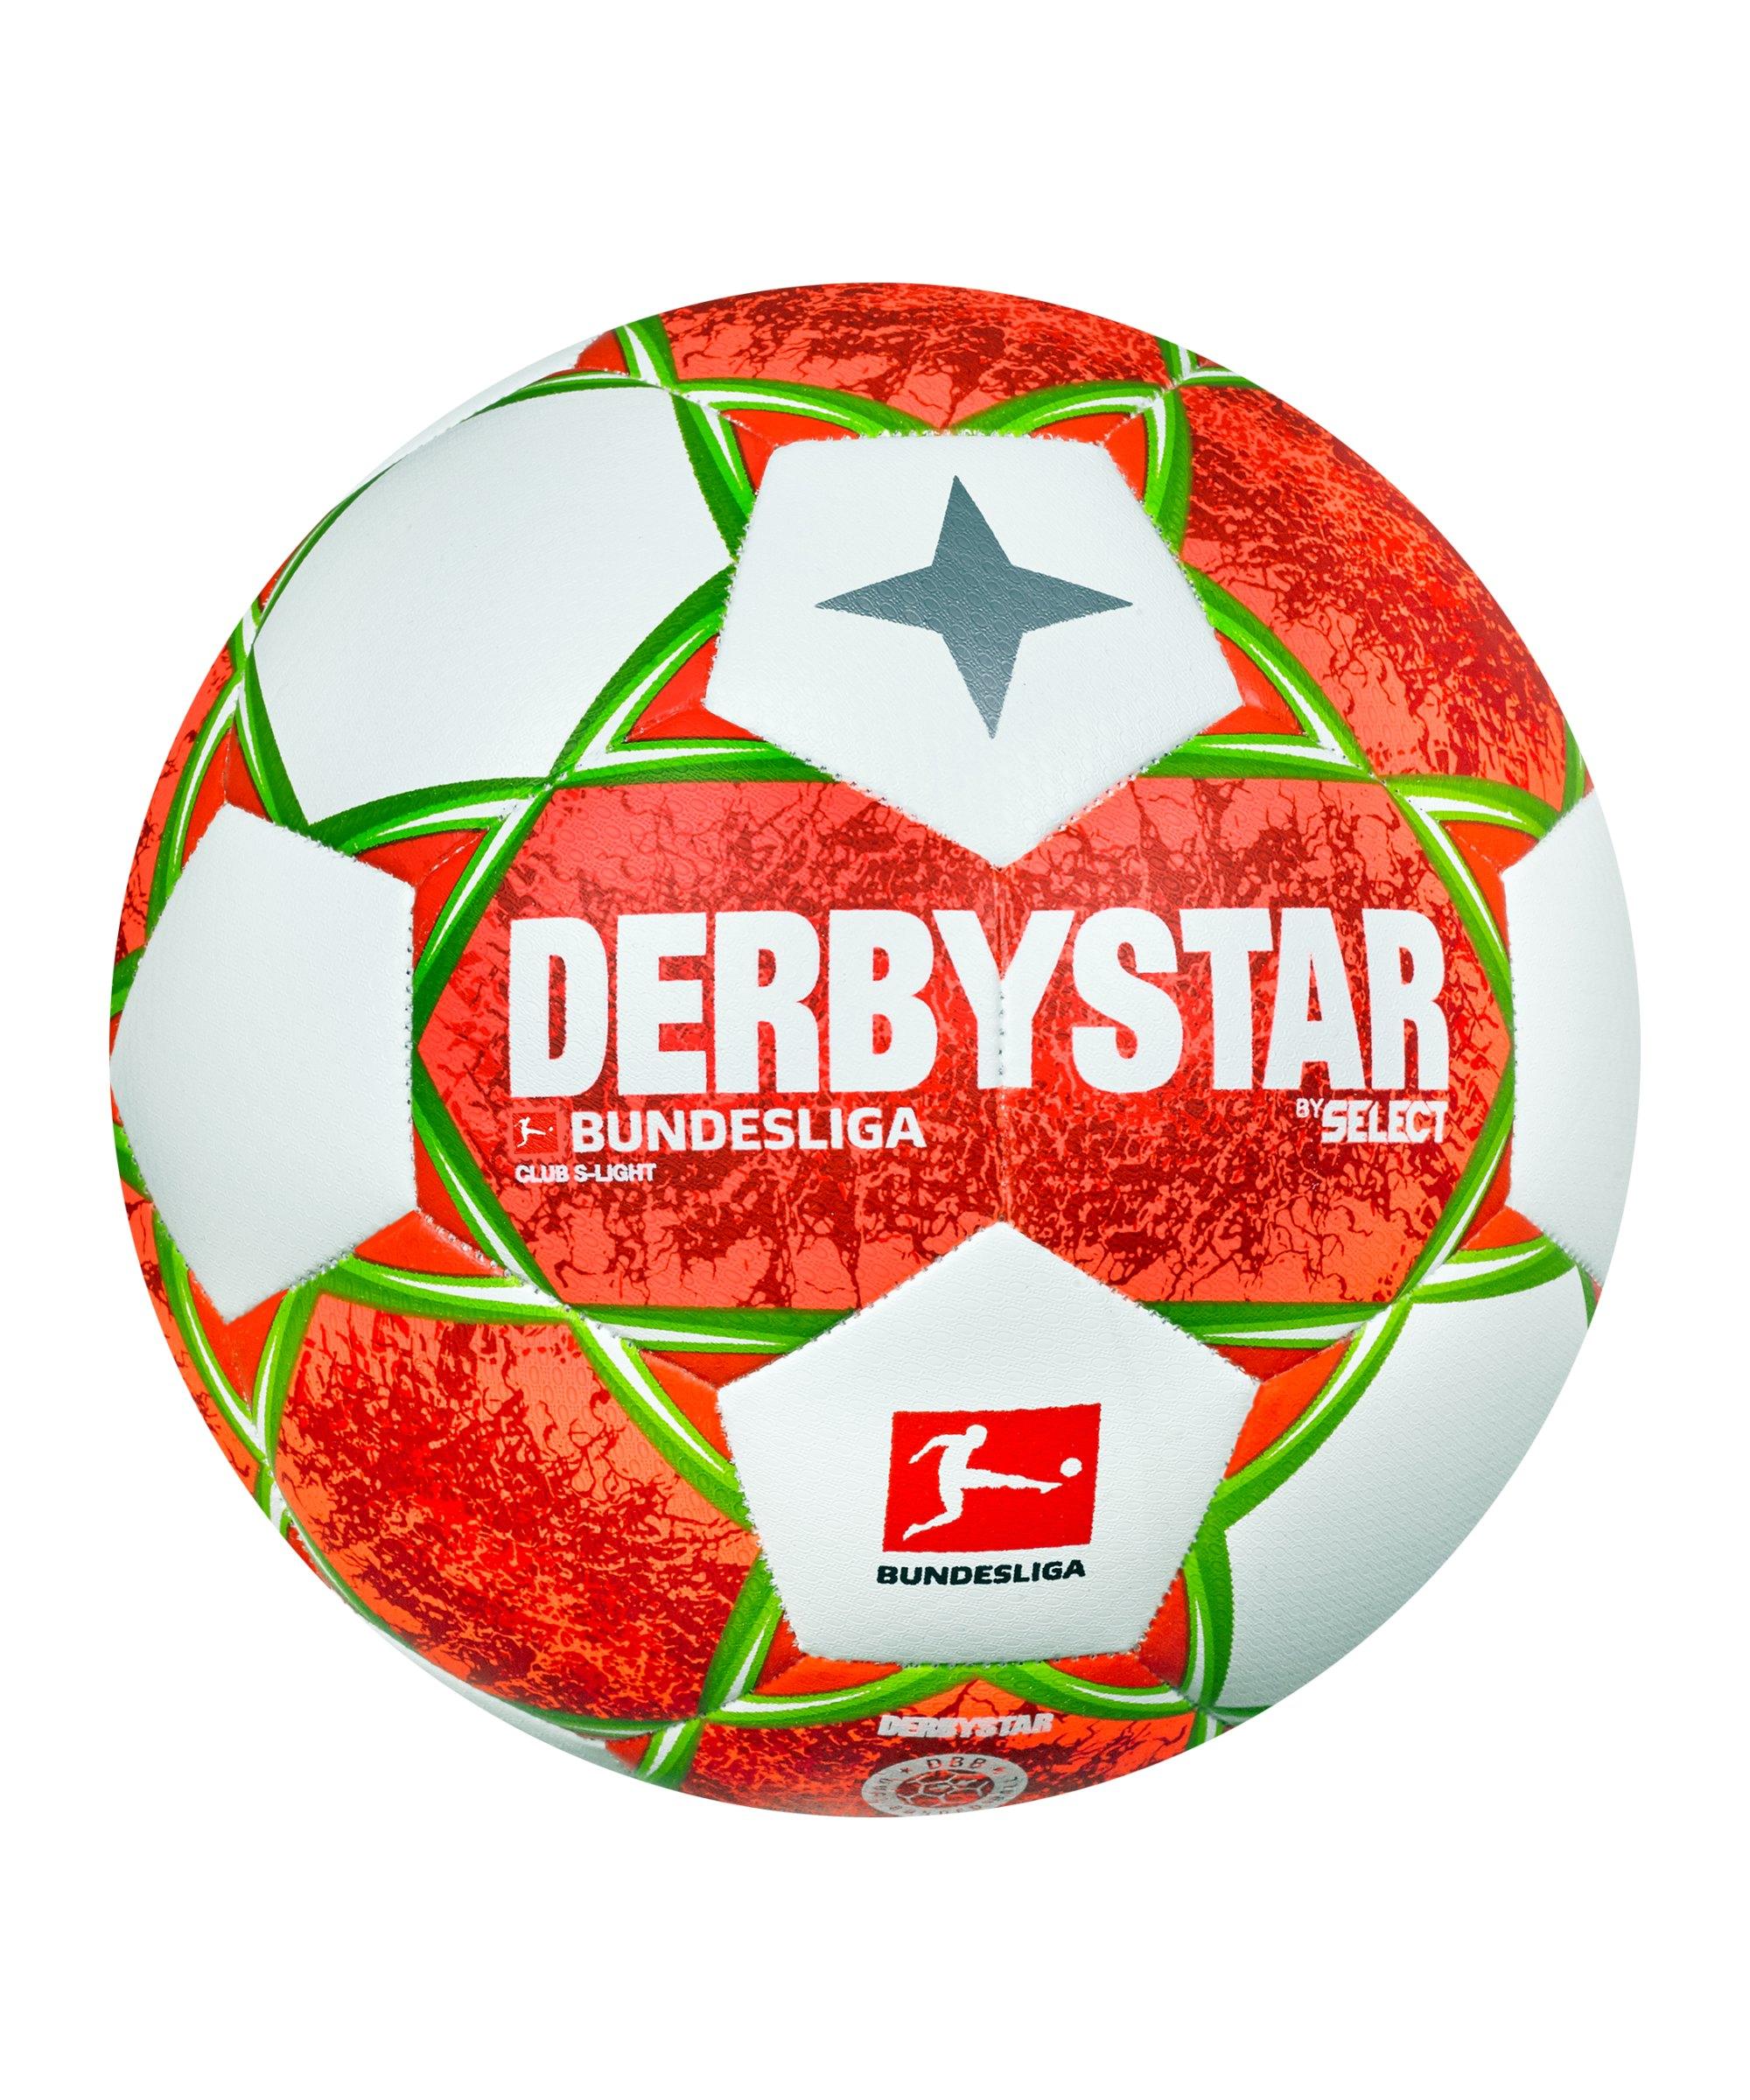 Derbystar Bundesliga Club S-Light v21 Trainingsball 290 Gr. 2021/2022 Grün Orange F021 - orange